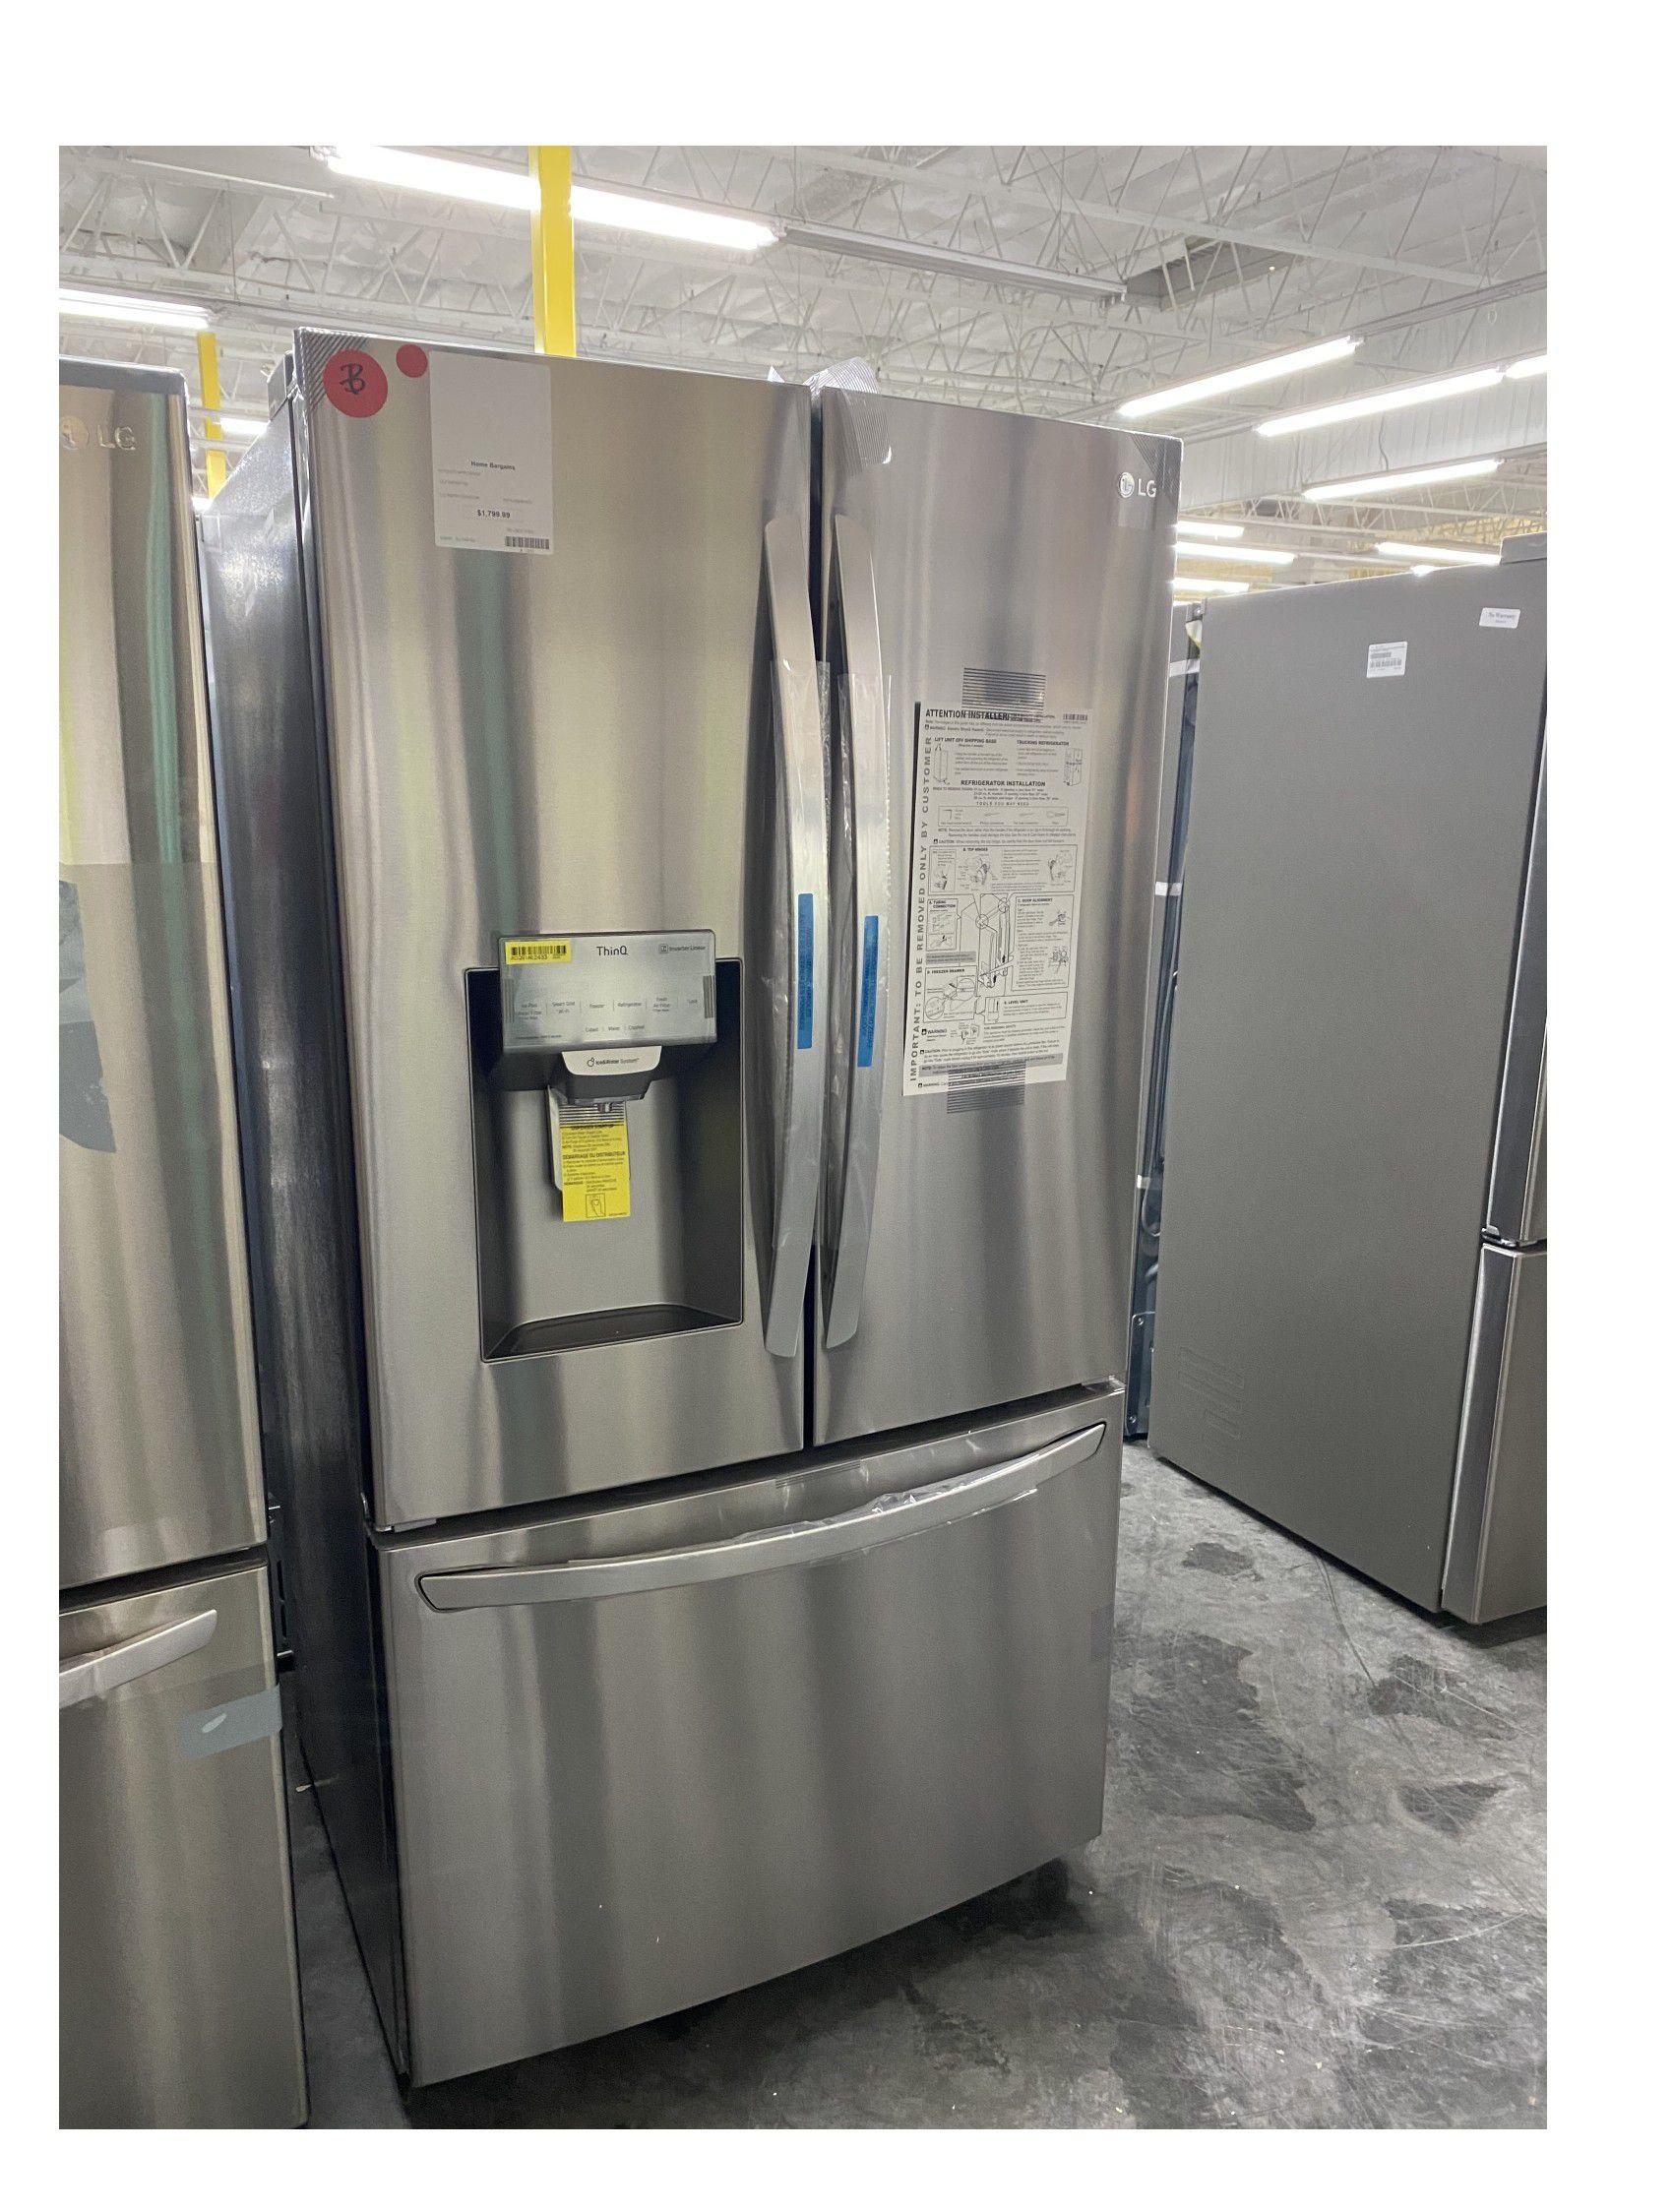 LG French Door Smart Refrigerator in Stainless Steel